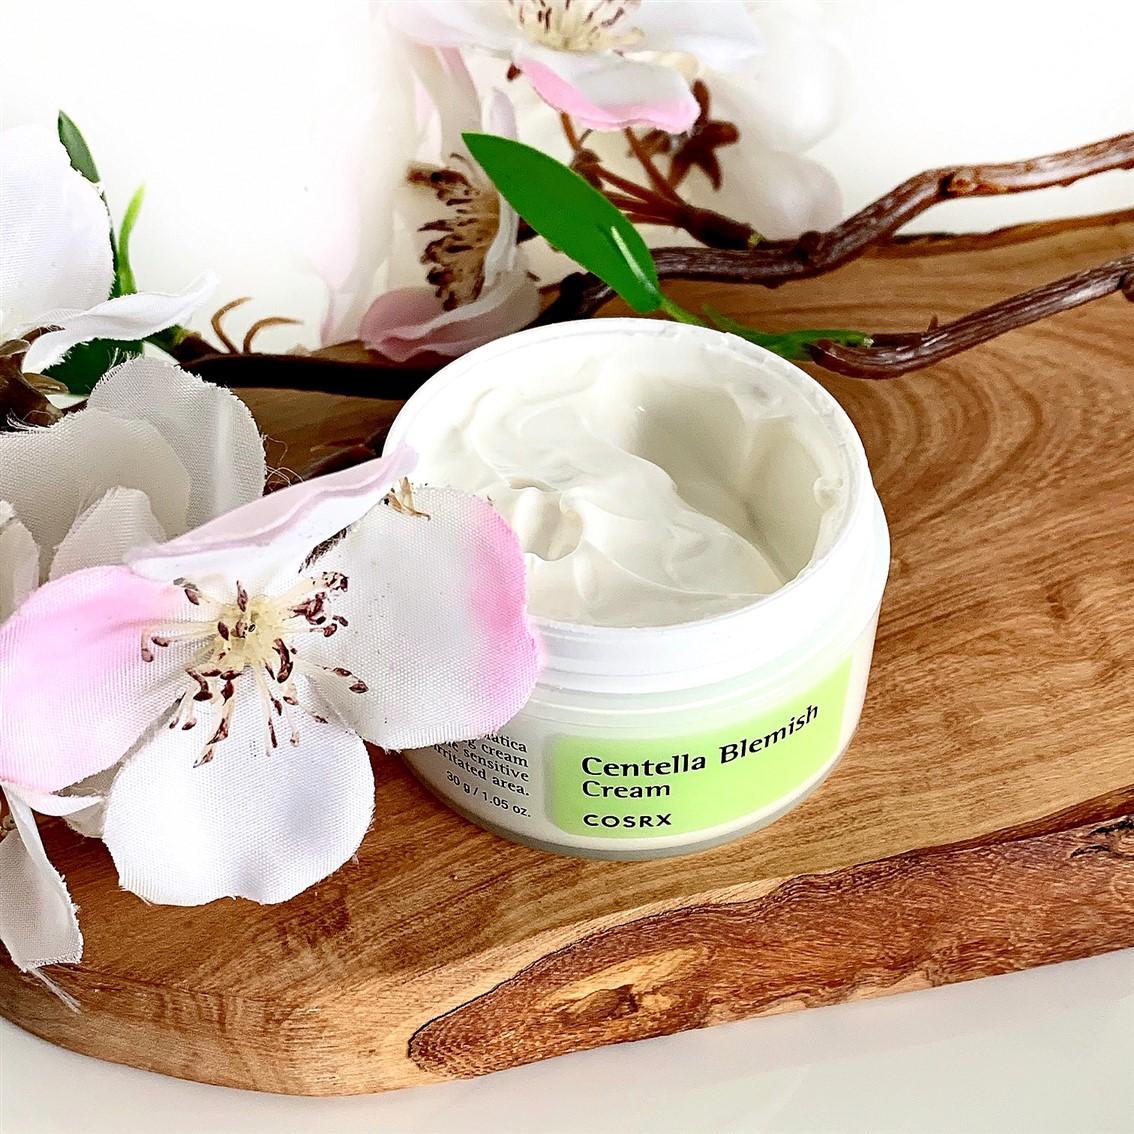 COSRX Centella Blemish Cream konsystencja